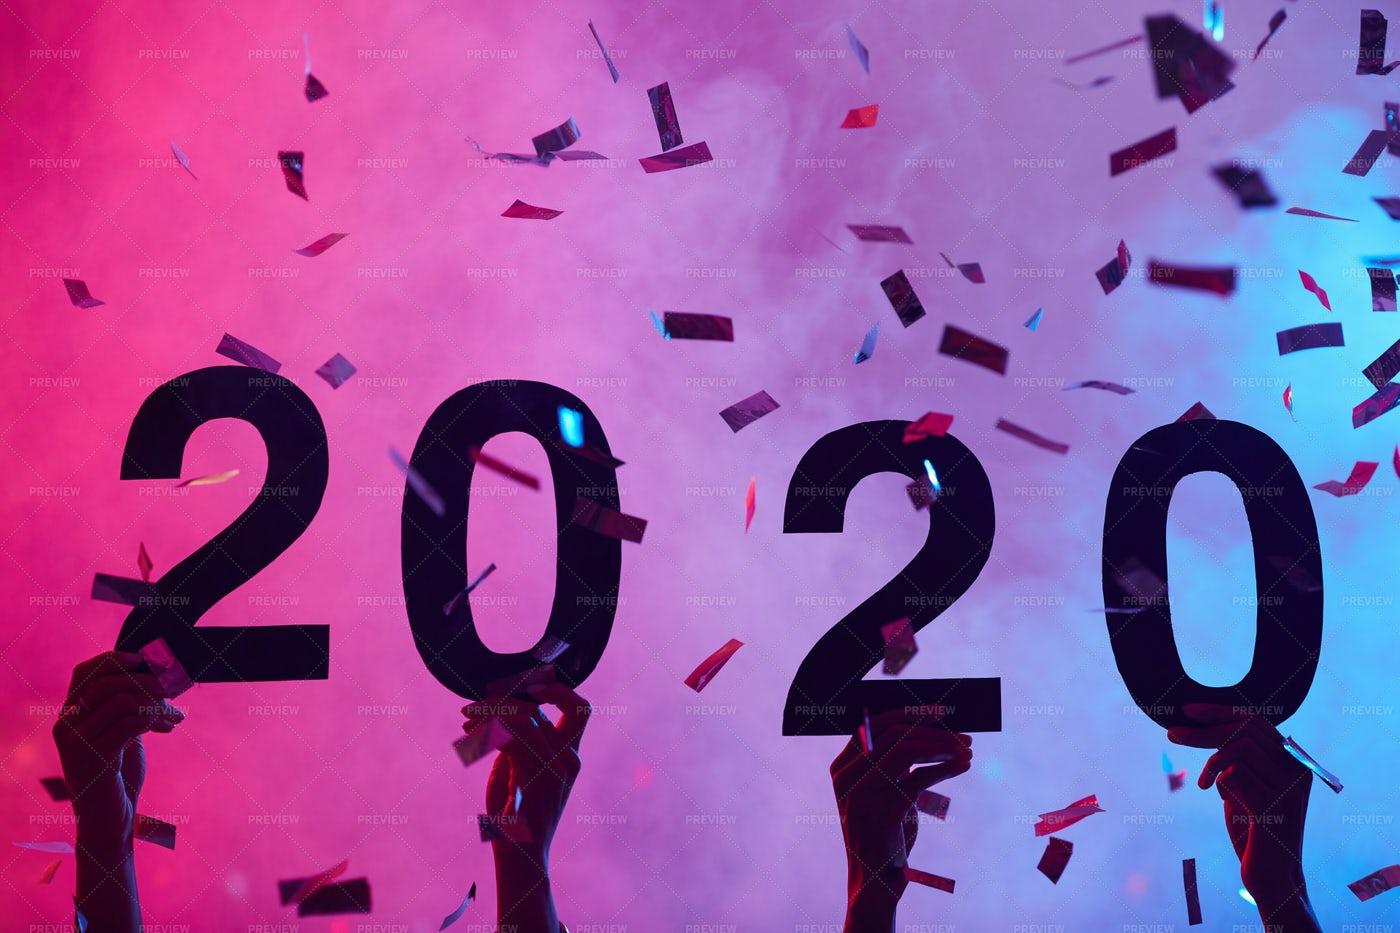 New Year 2020: Stock Photos